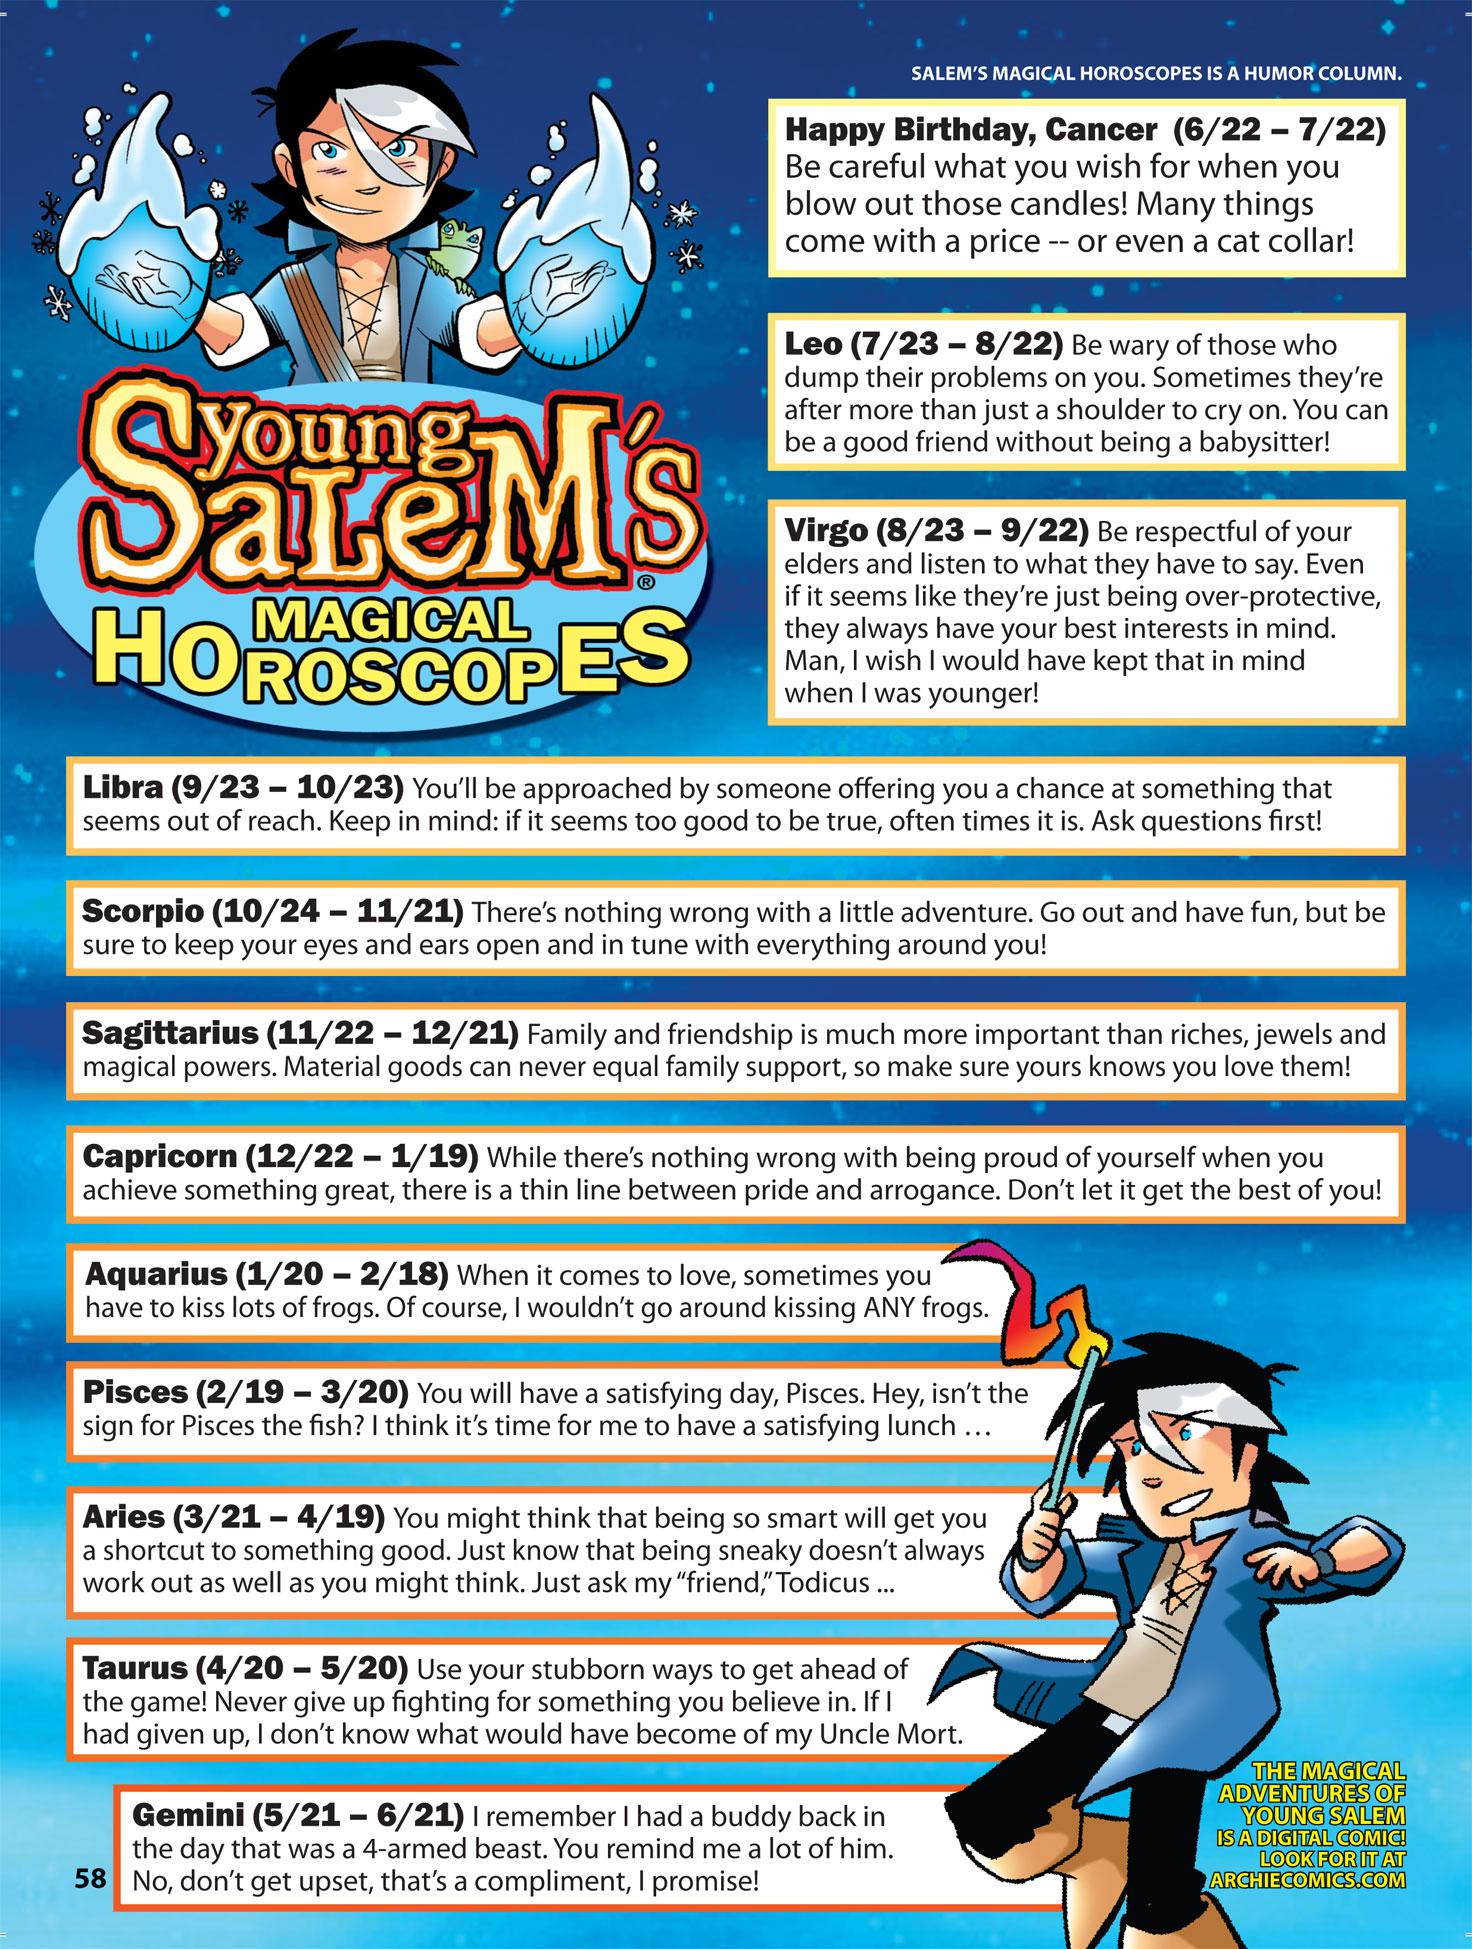 Young Salem's Magical Horoscopes